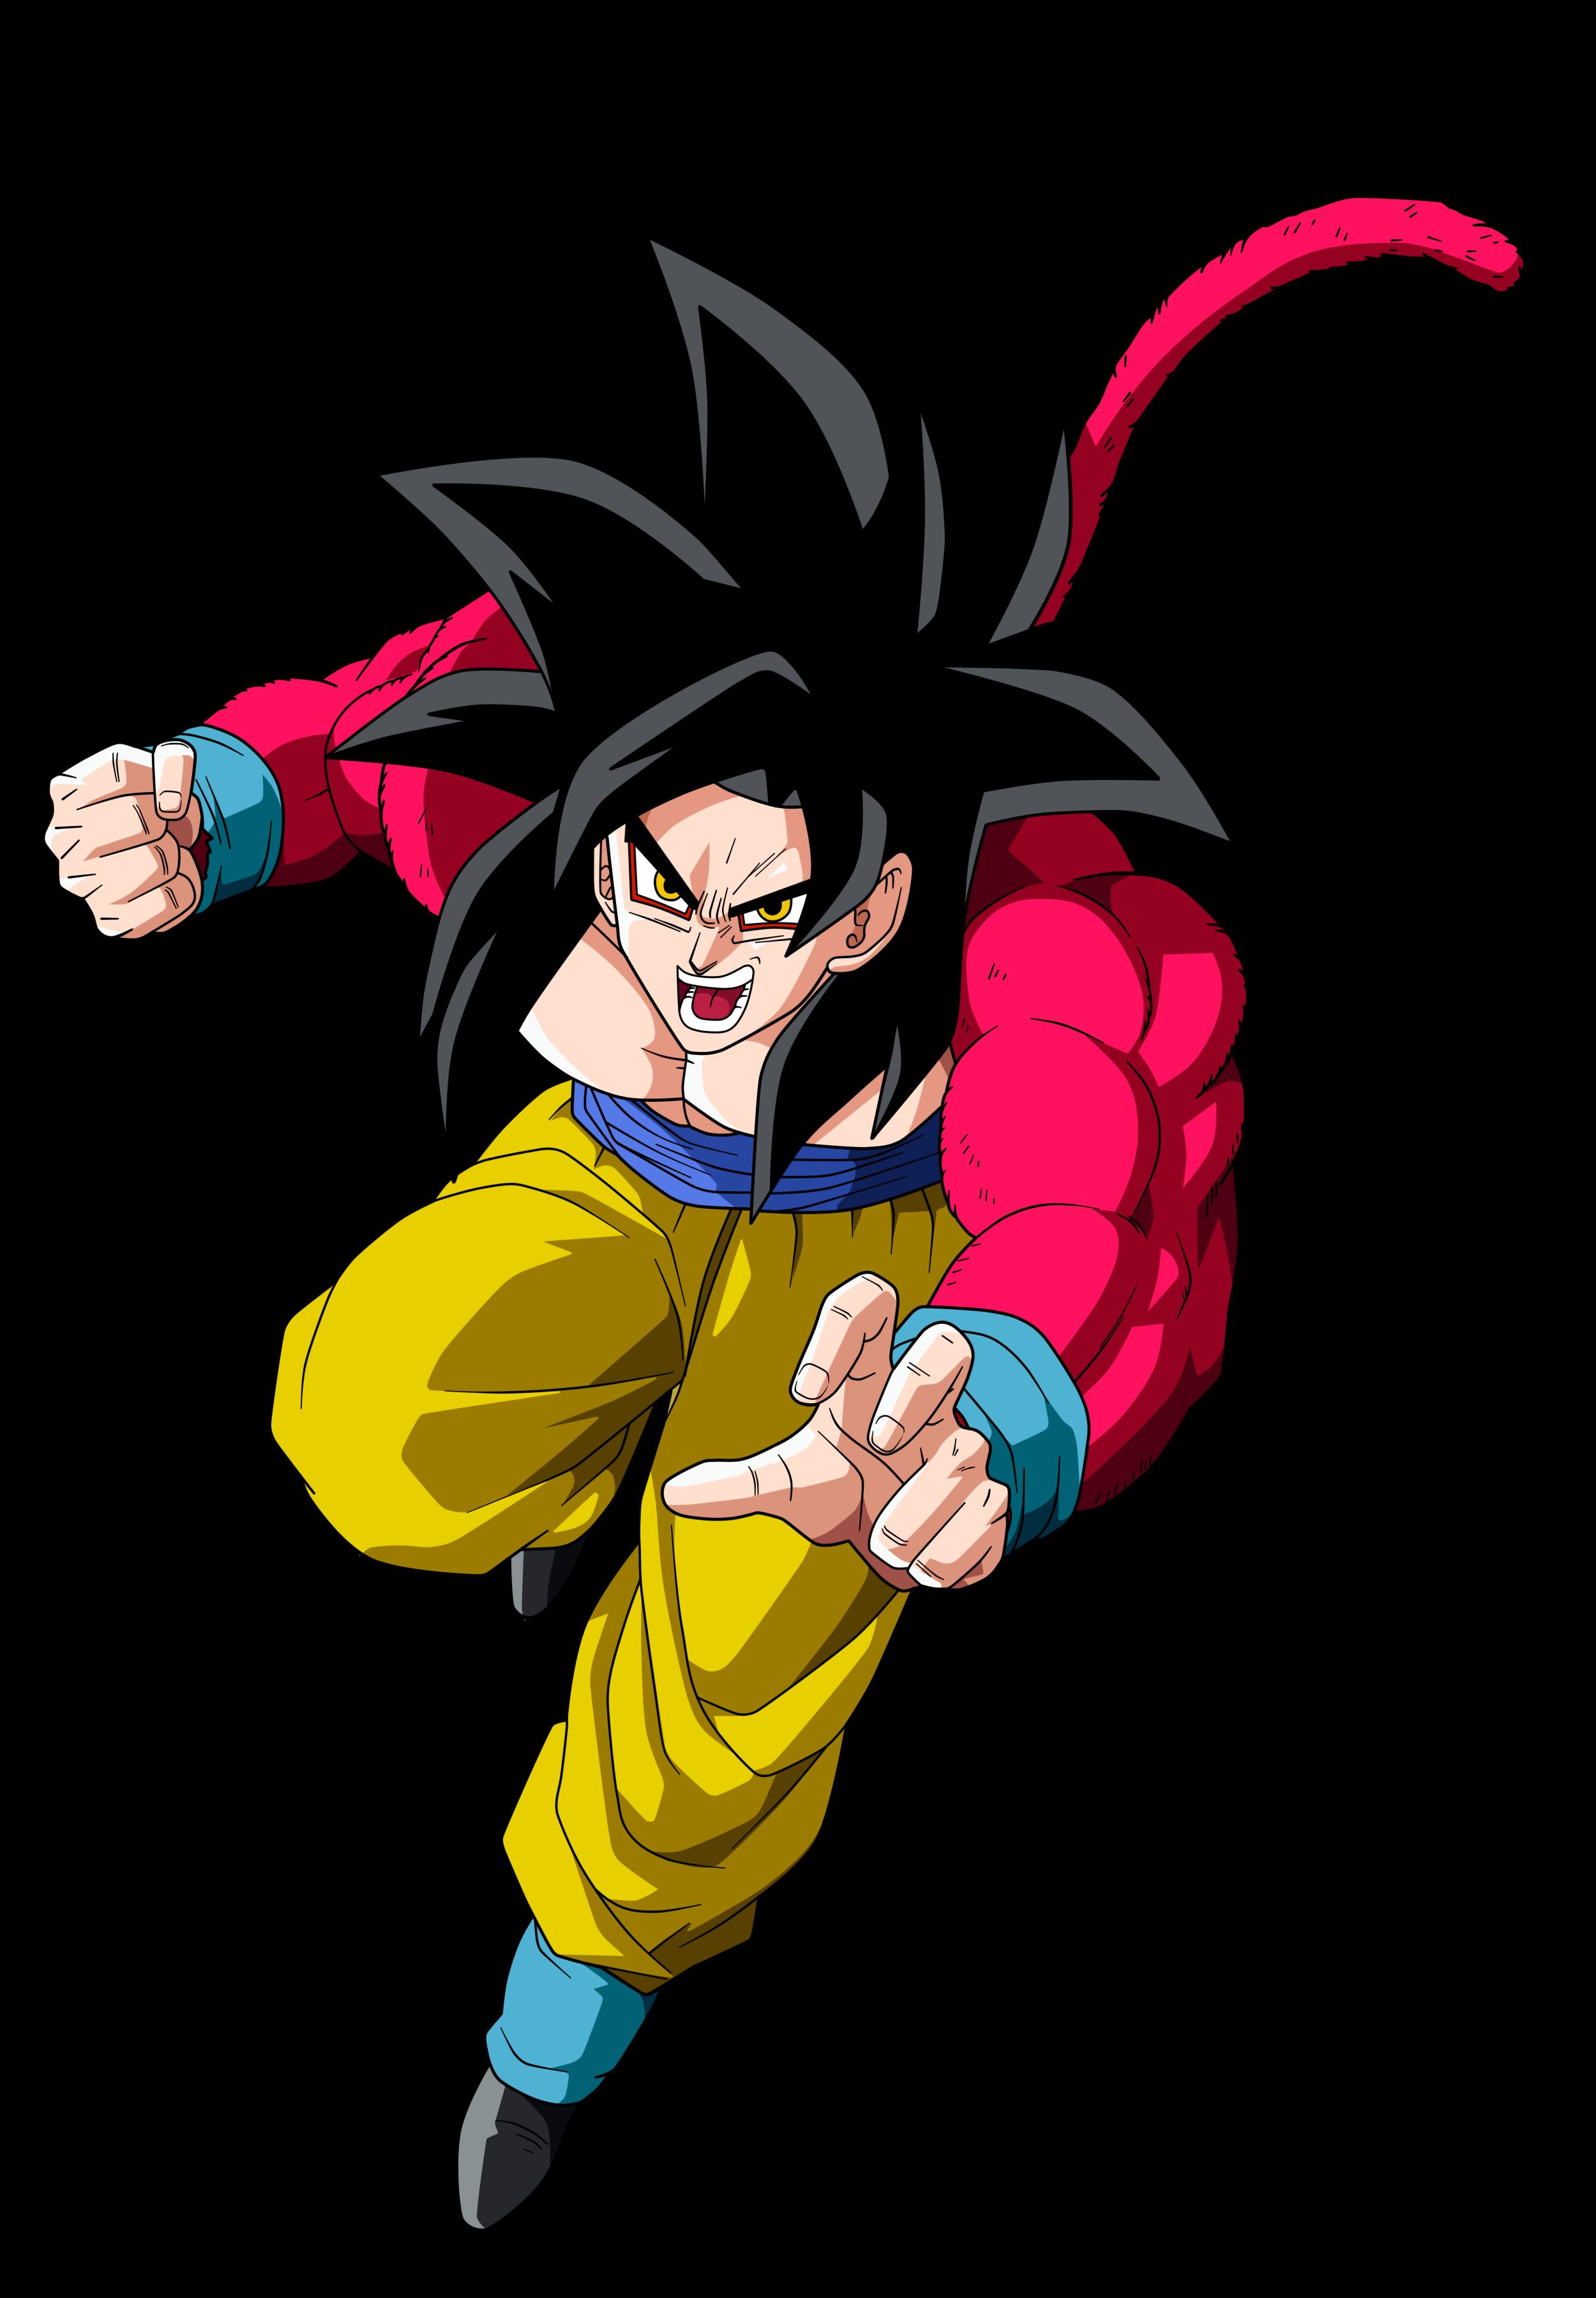 Goku SSJ4 by RenderDragonball on DeviantArt